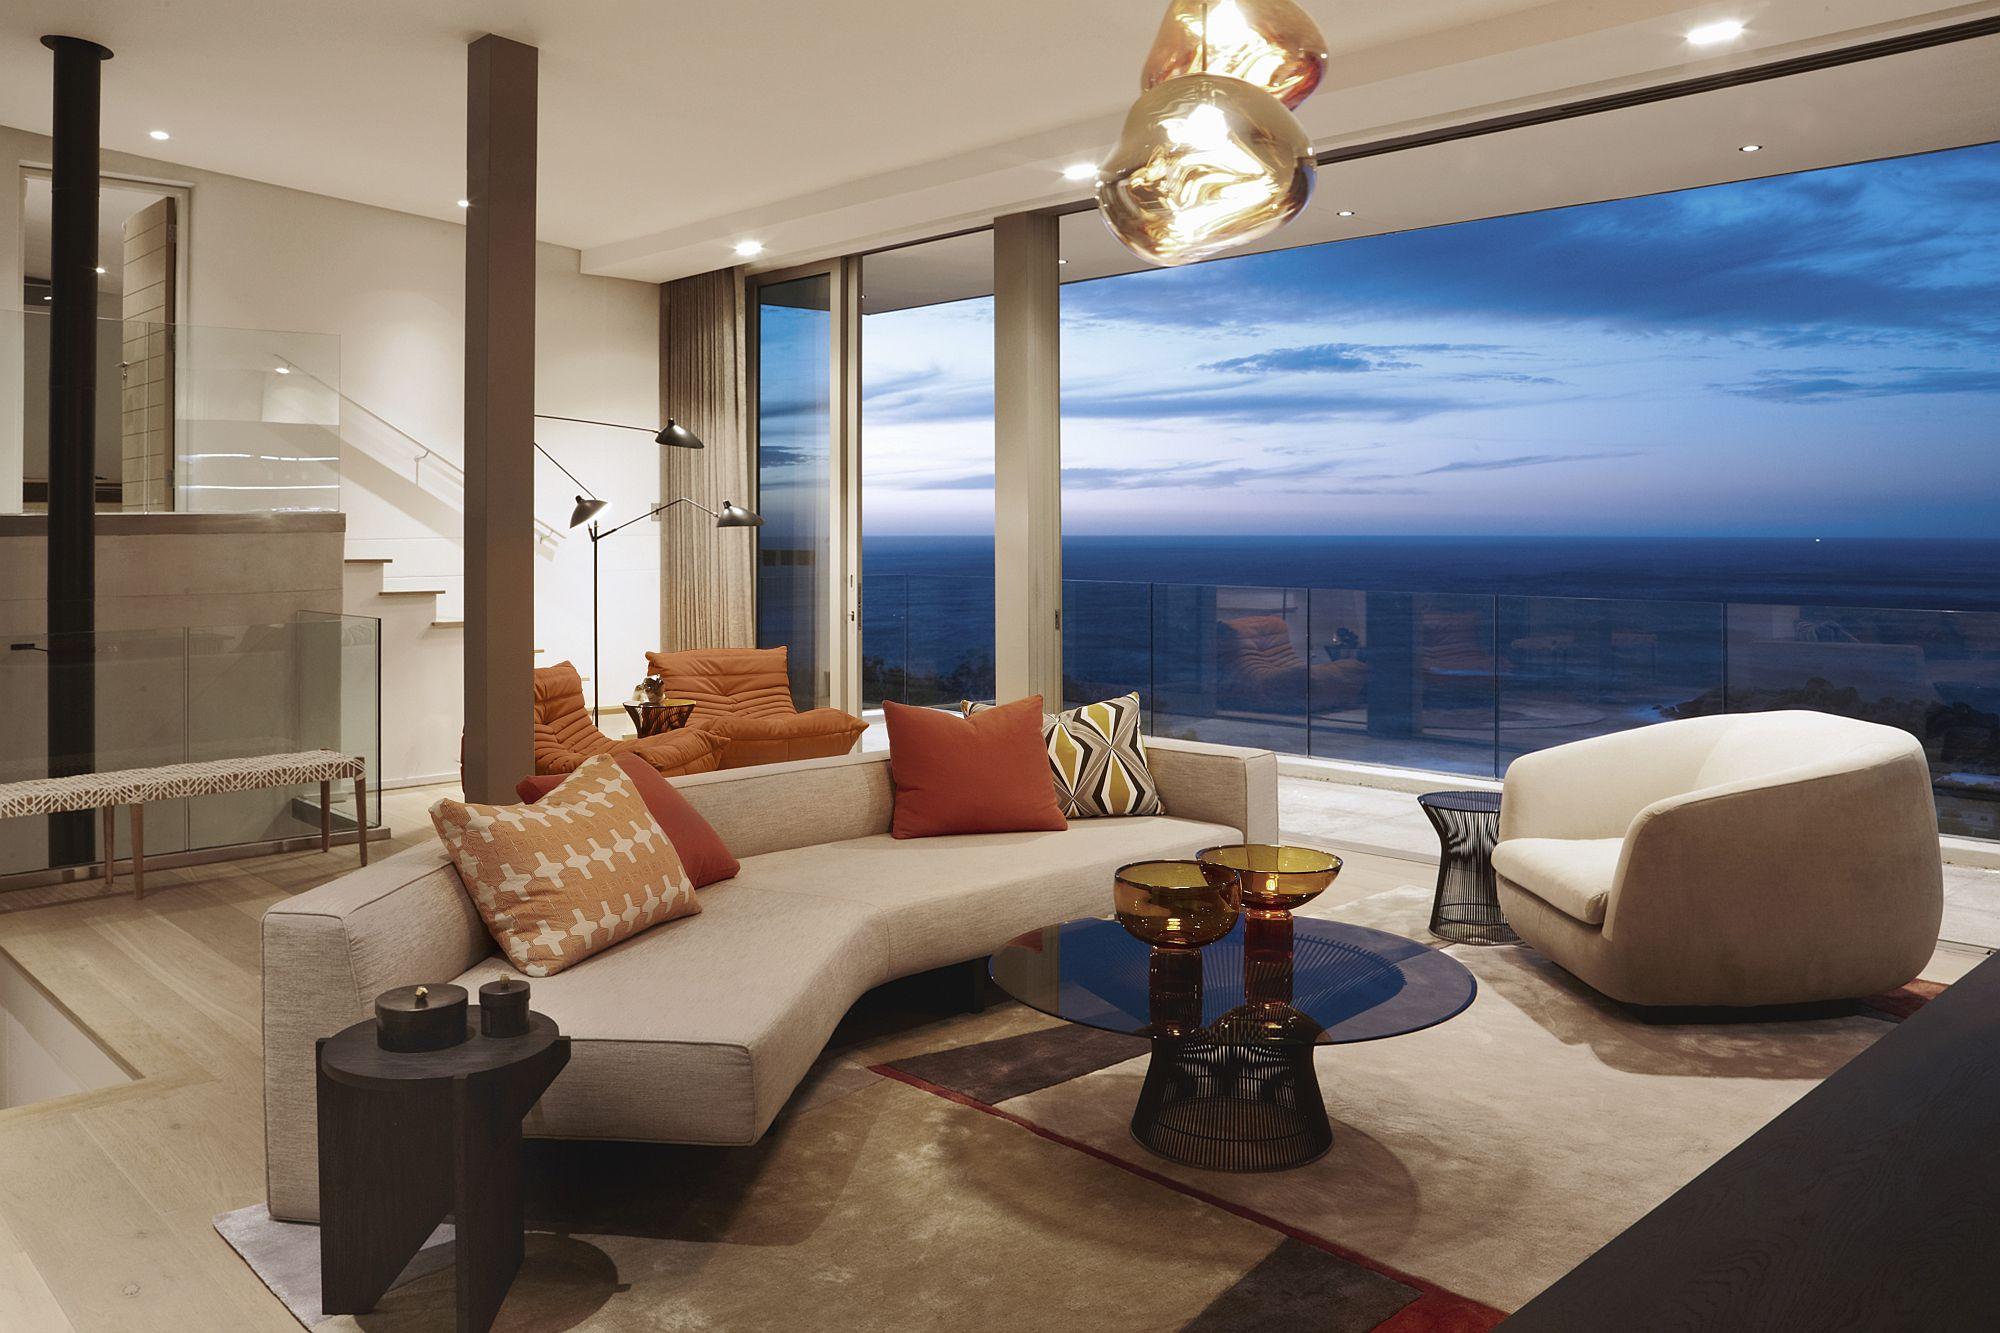 Exquisite living area with ocean views